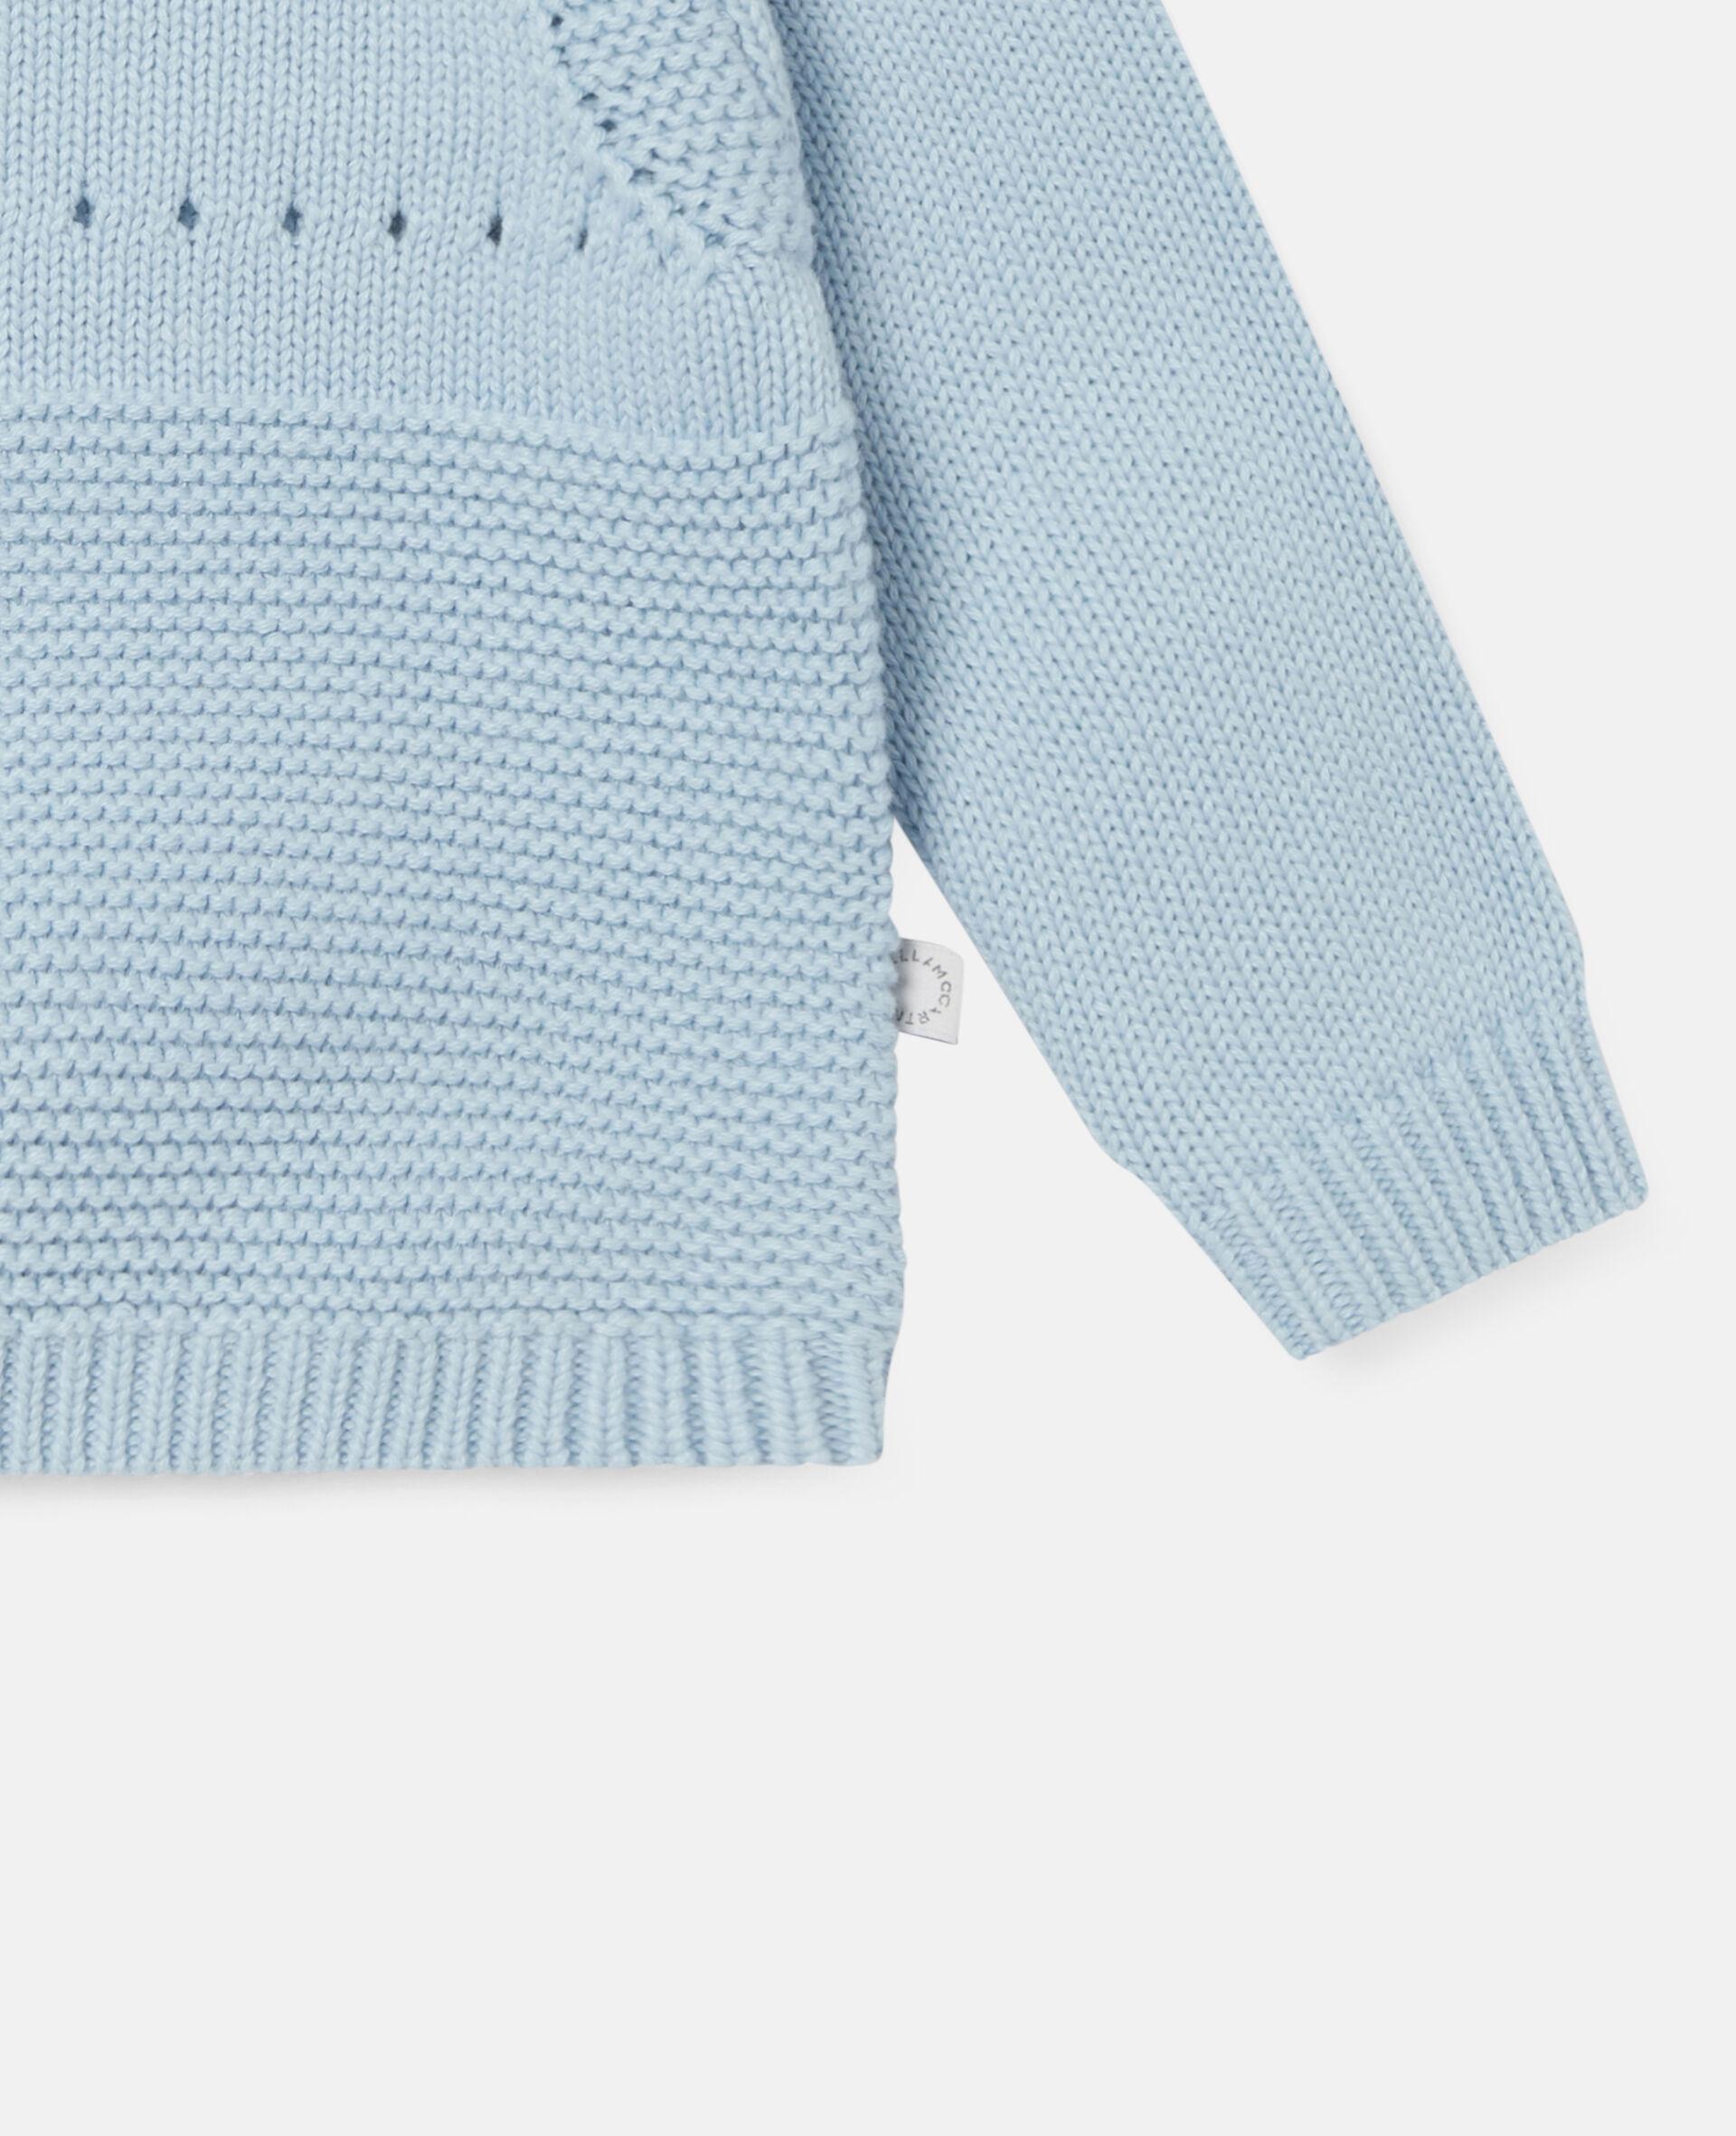 Happy Dog Knit Intarsia Sweater-Blue-large image number 2